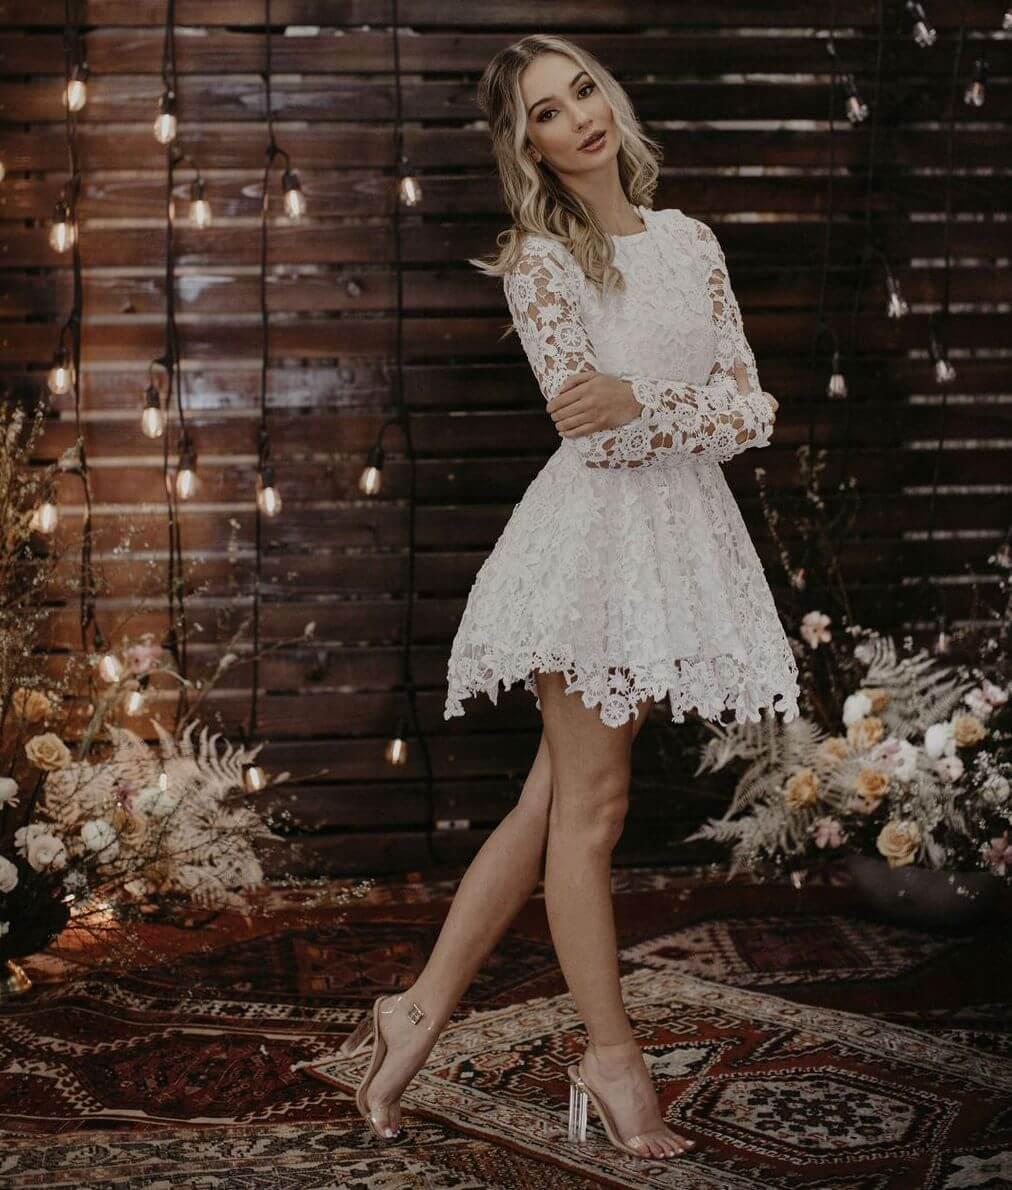 Daniela Short Lace Boho Wedding Dress | Dreamers and Lovers